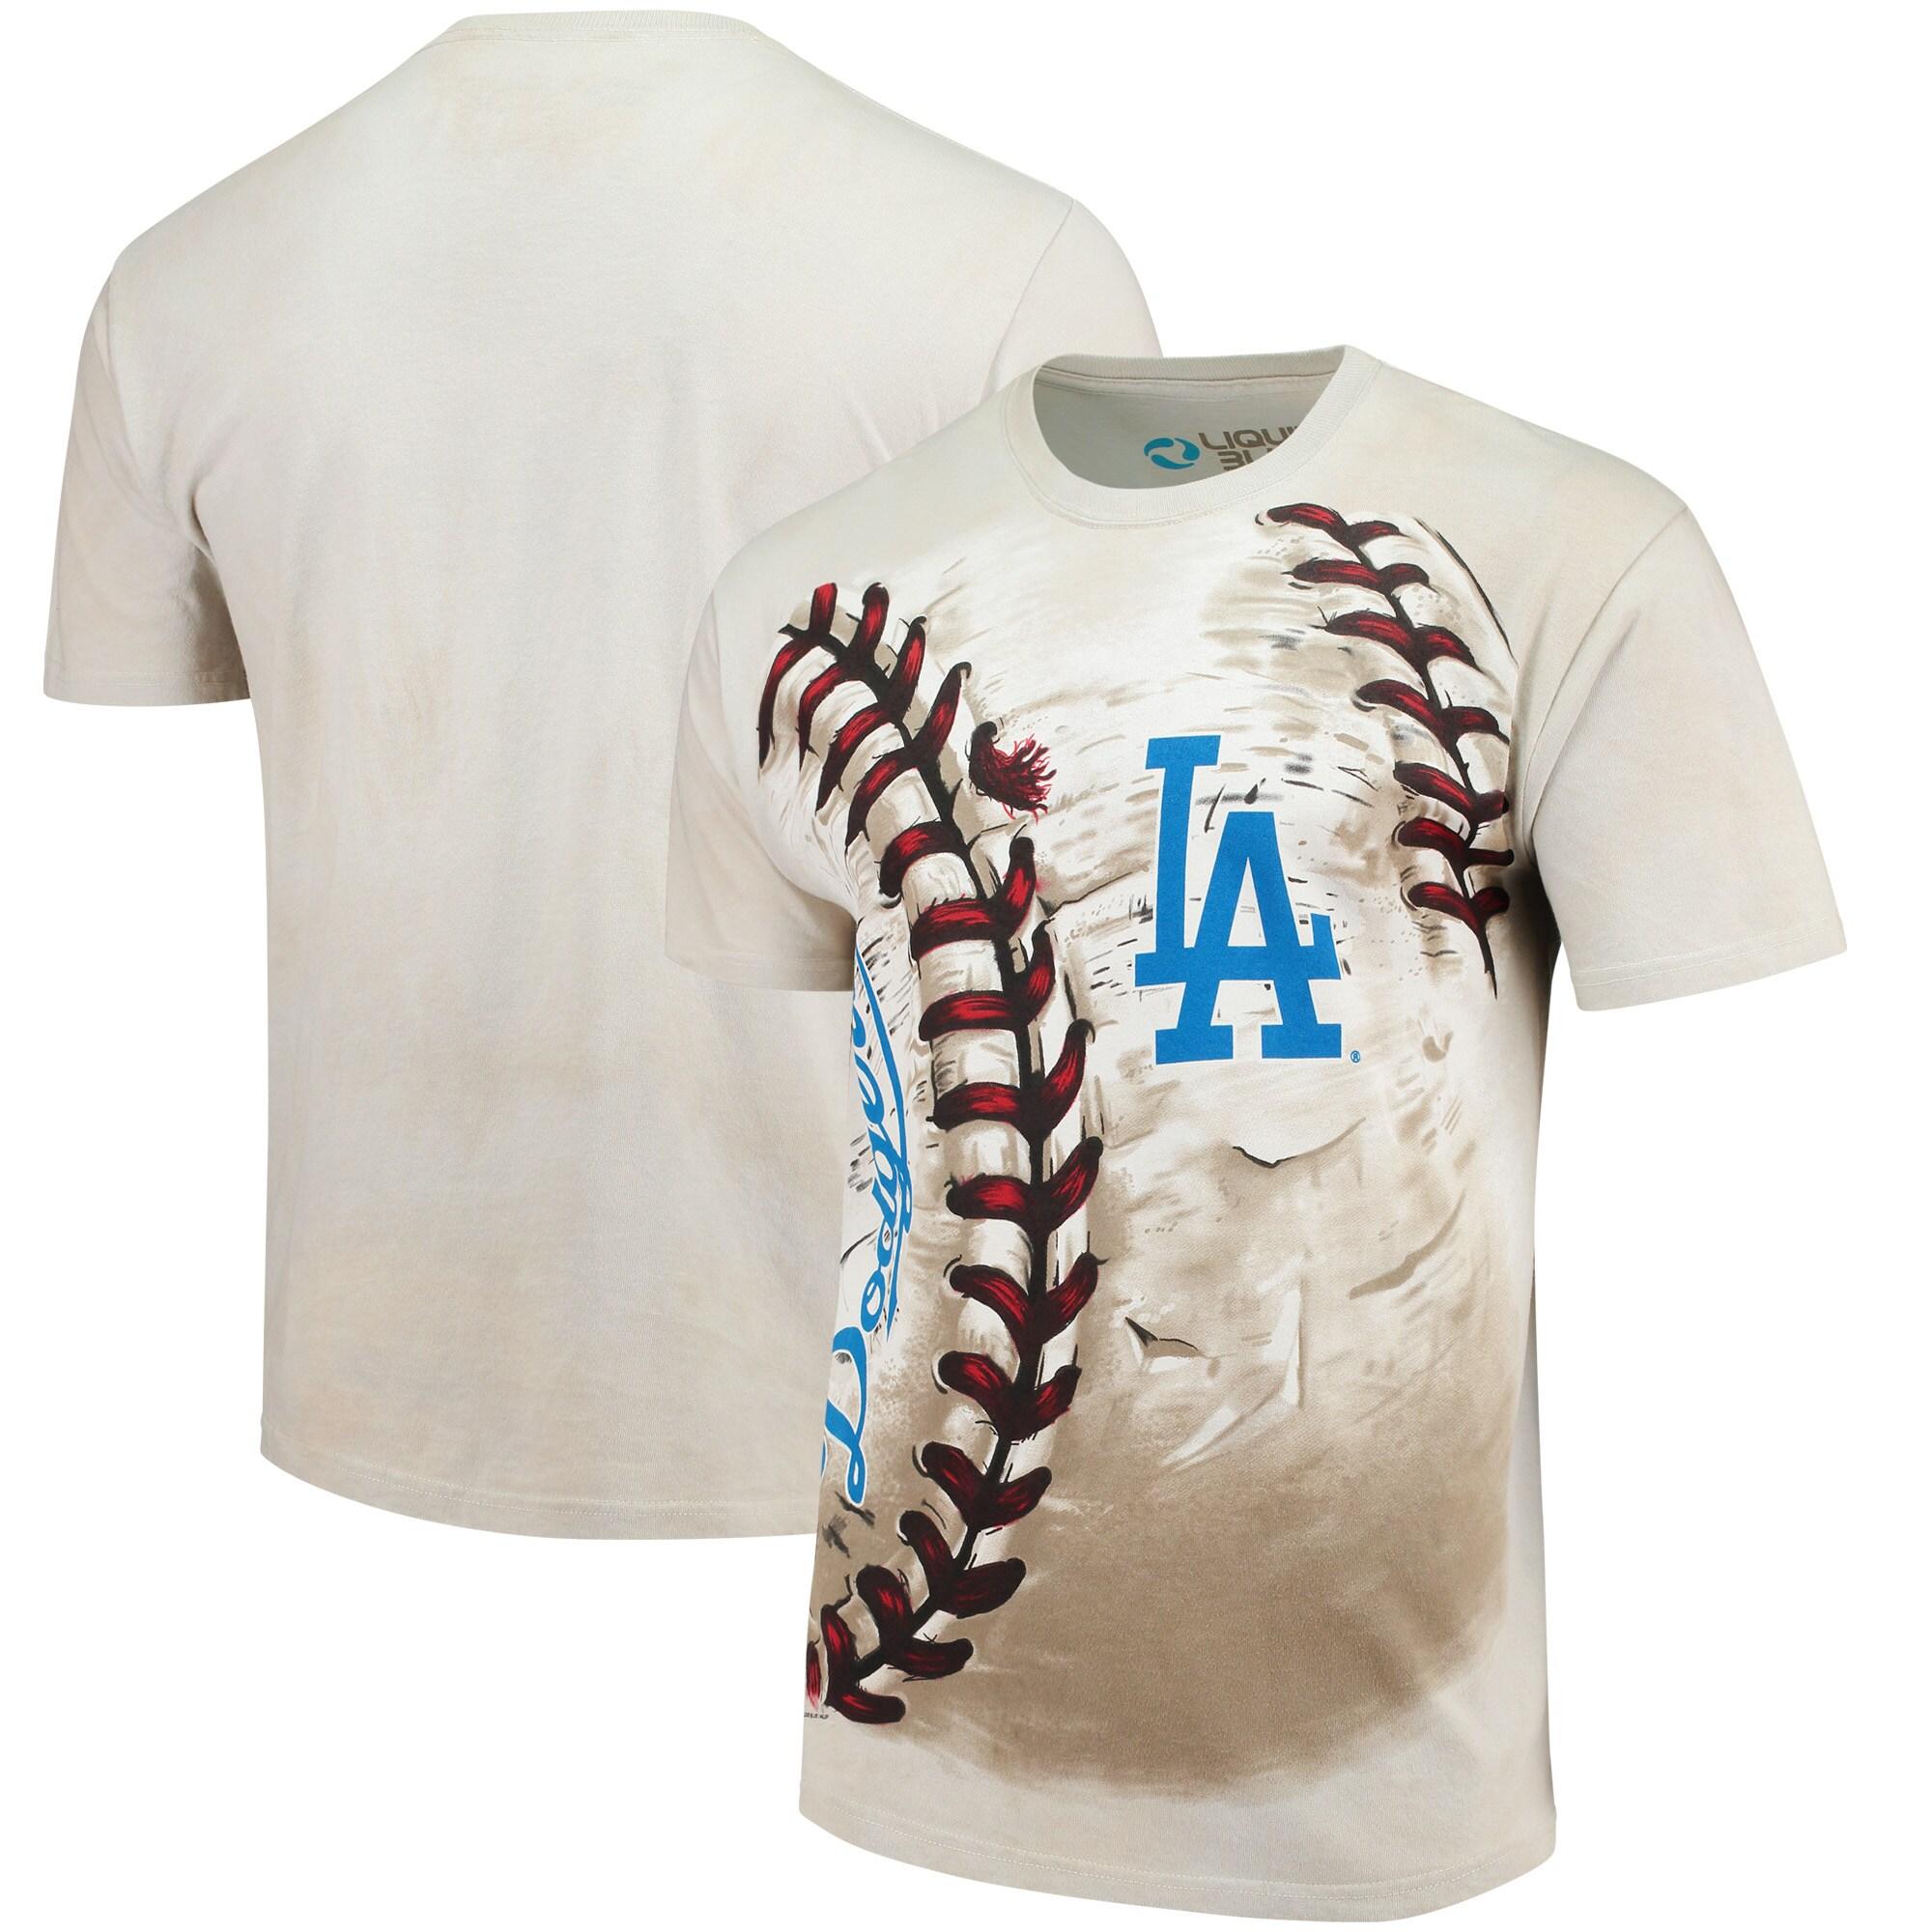 Los Angeles Dodgers Hardball Tie-Dye T-Shirt - Cream